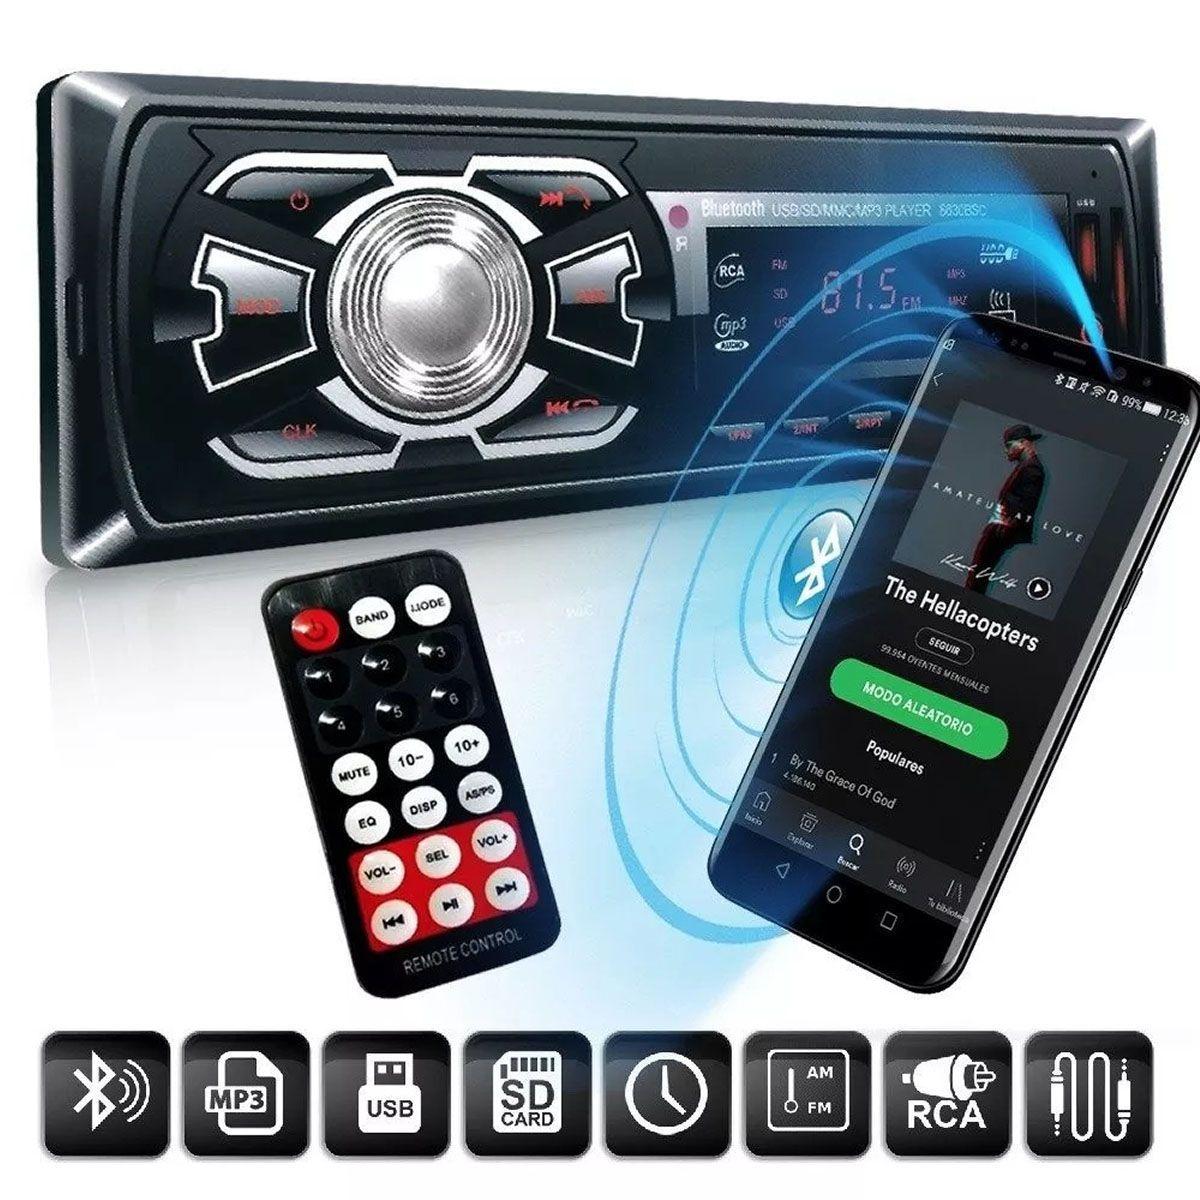 Som Automotivo First Option Preto com Bluetooth Atendimento Celular Usb Sd Mp3 Player Fm Auxiliar 1 Din Universal Poliparts